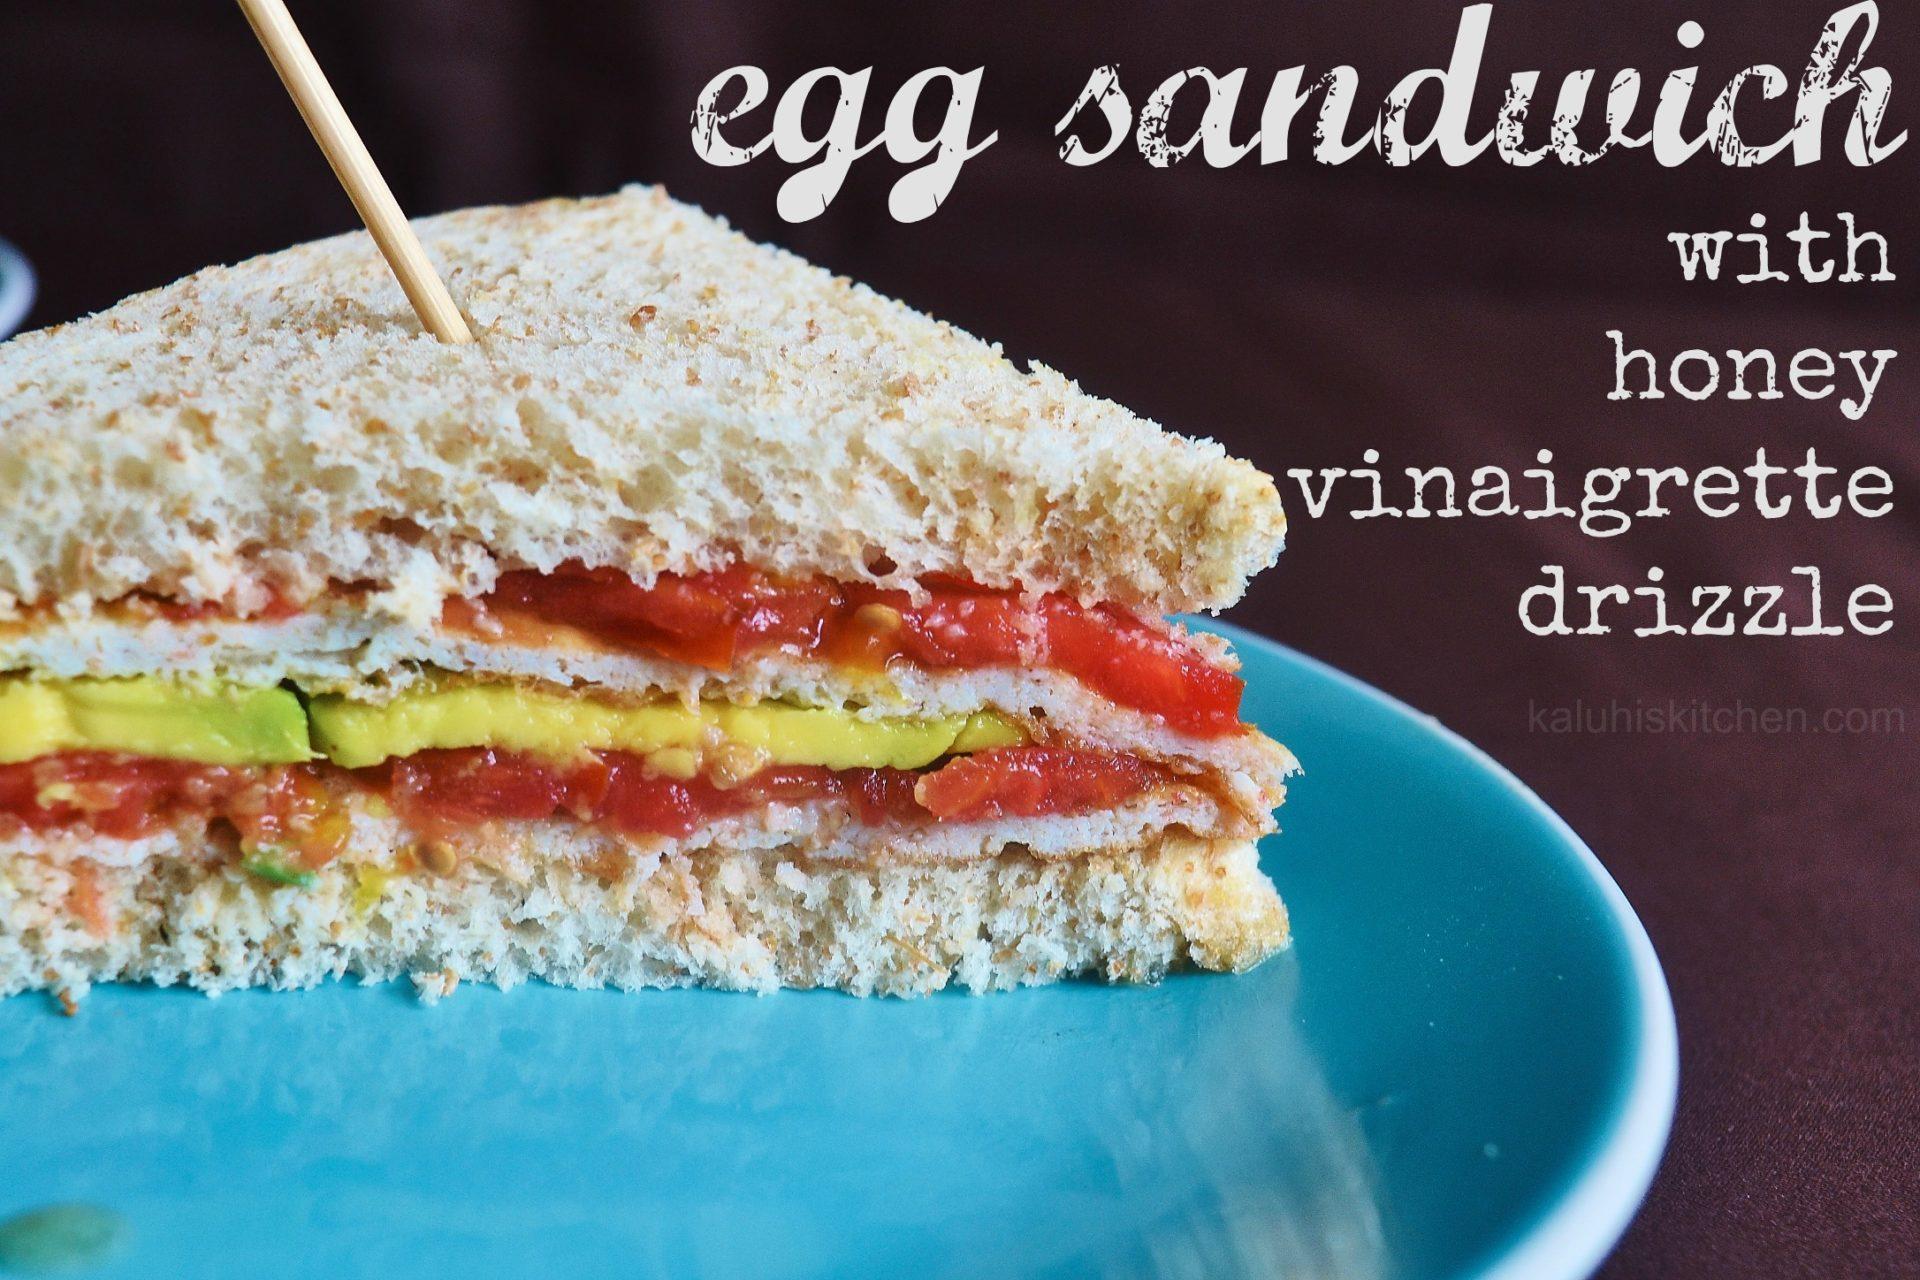 egg sandwich with honey vinaigrette_best kenyan food bloggers_top Nairobi food bloggers_how to make egg sandwich